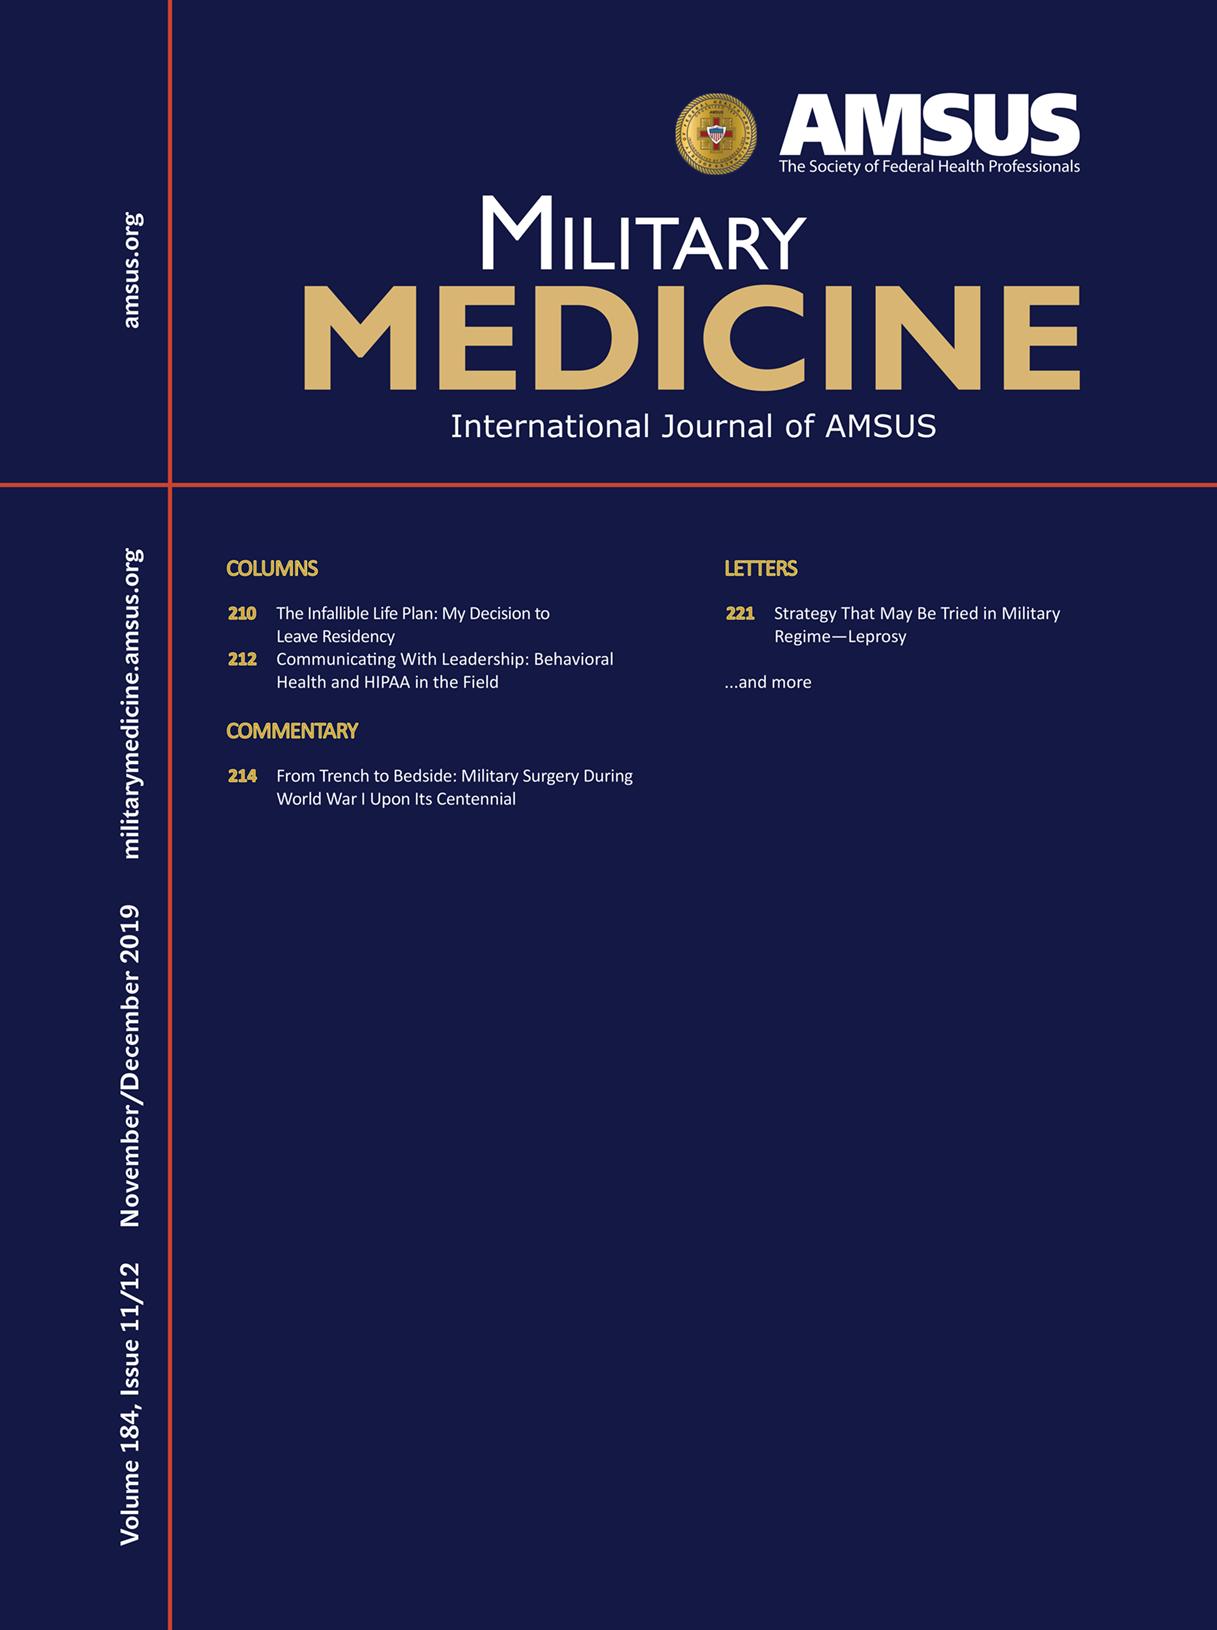 Military Medicine journal